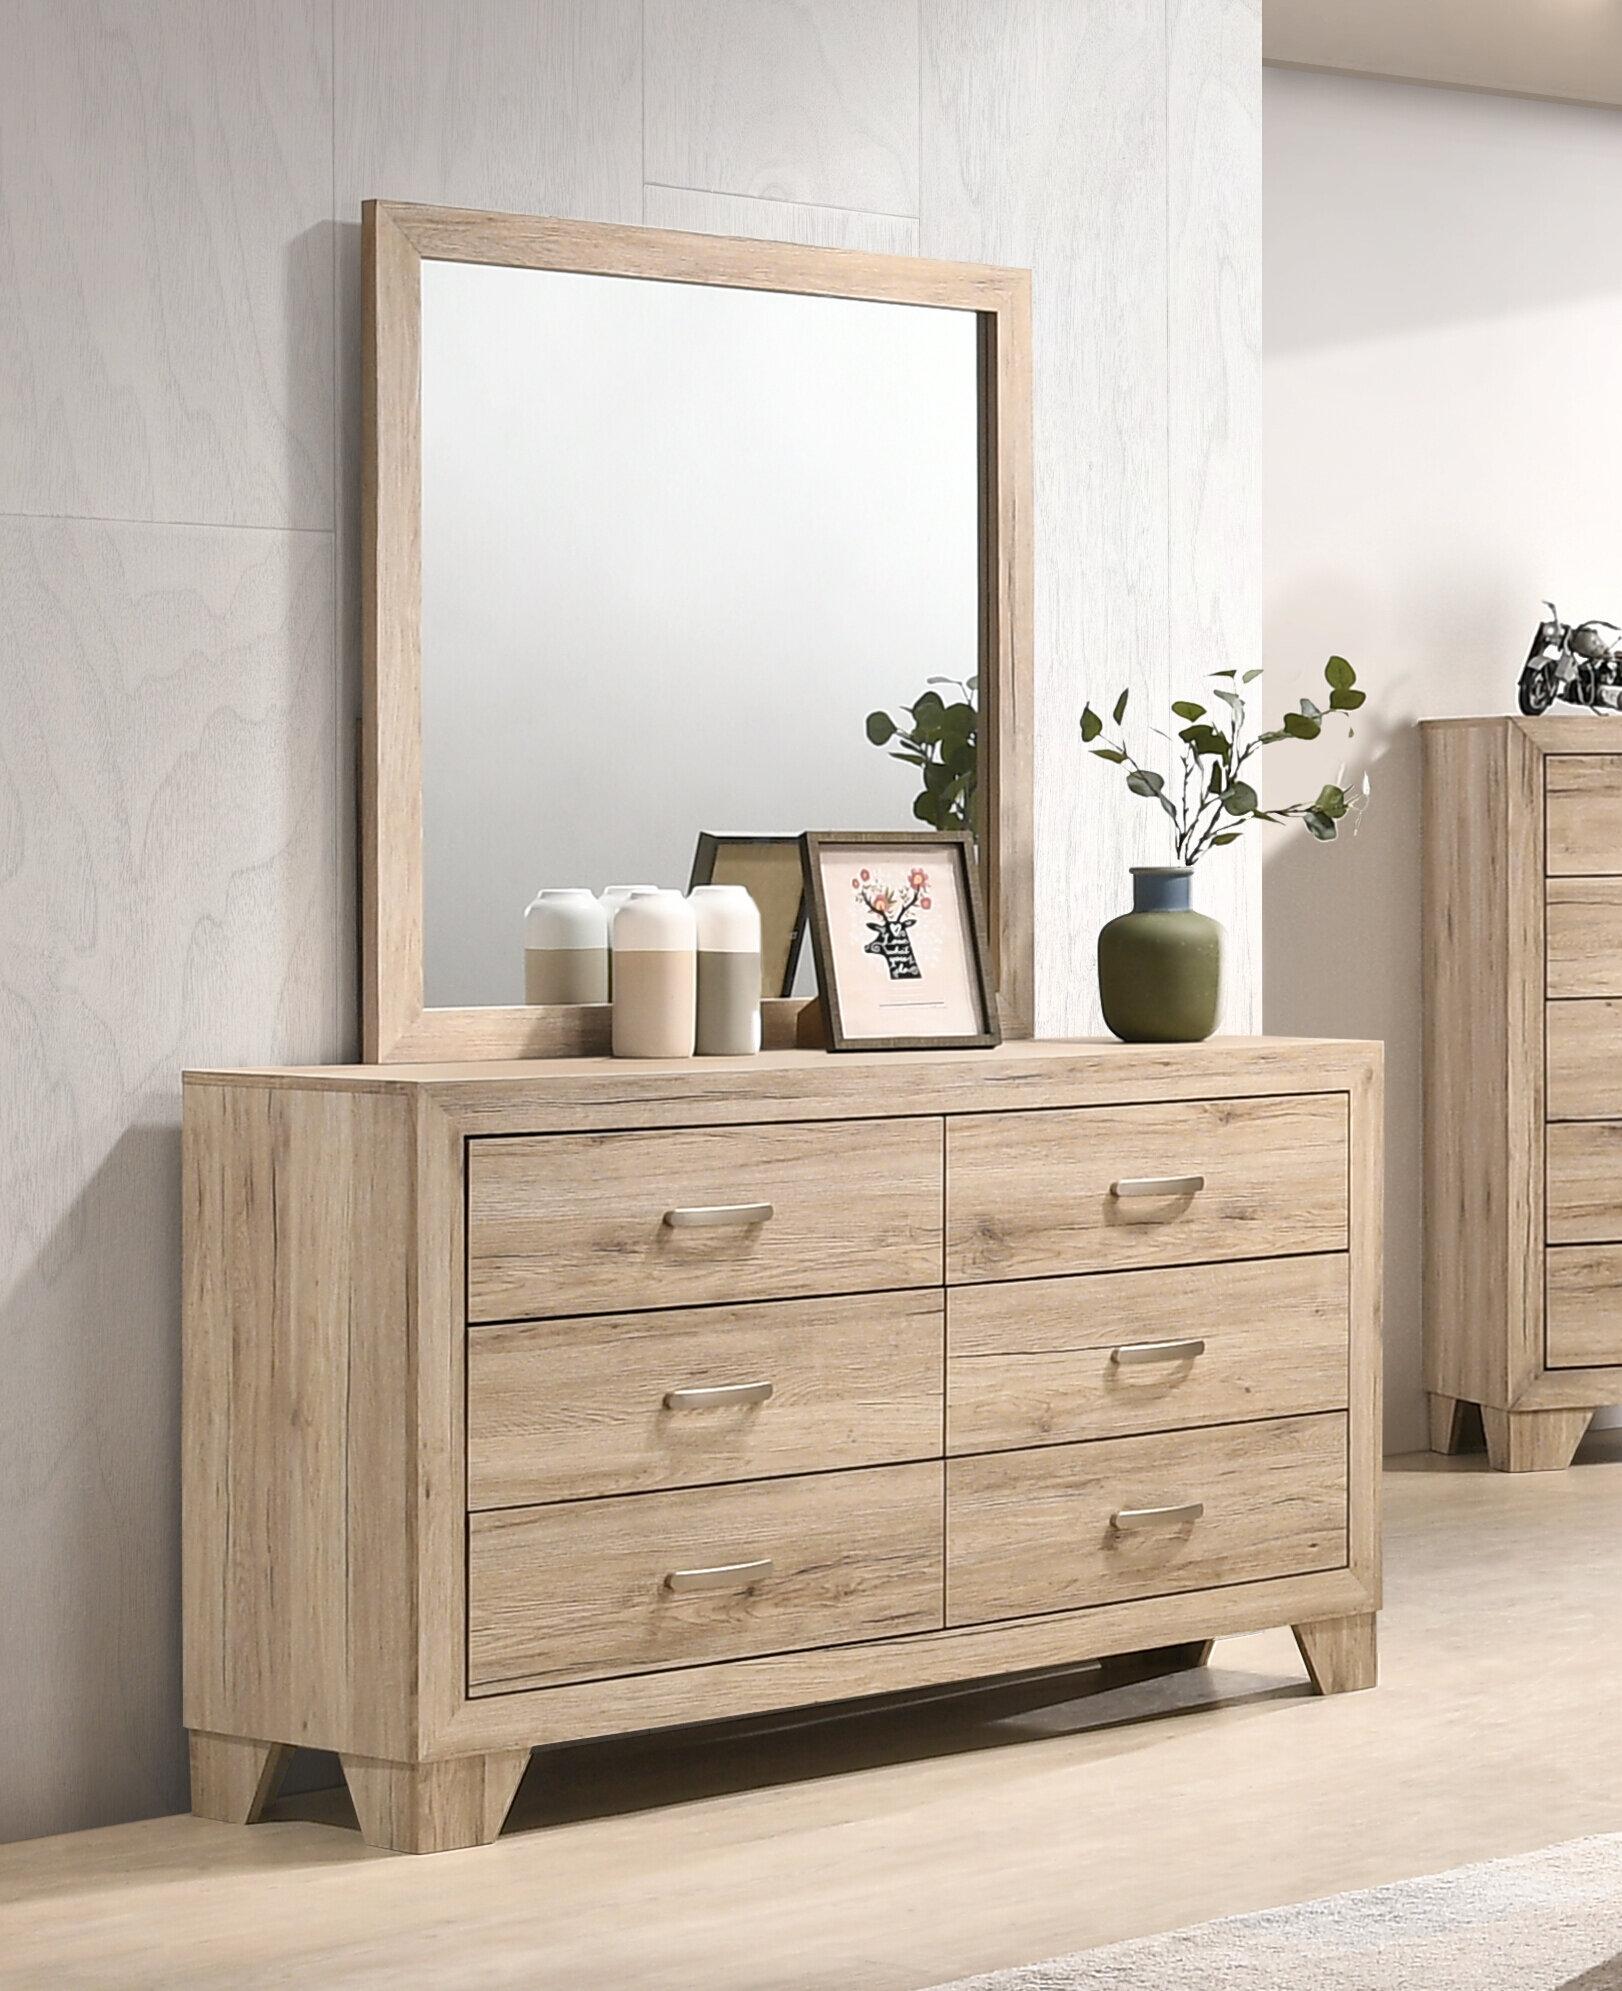 Millwood Pines Jaziel 6 Drawer Double Dresser With Mirror Reviews Wayfair